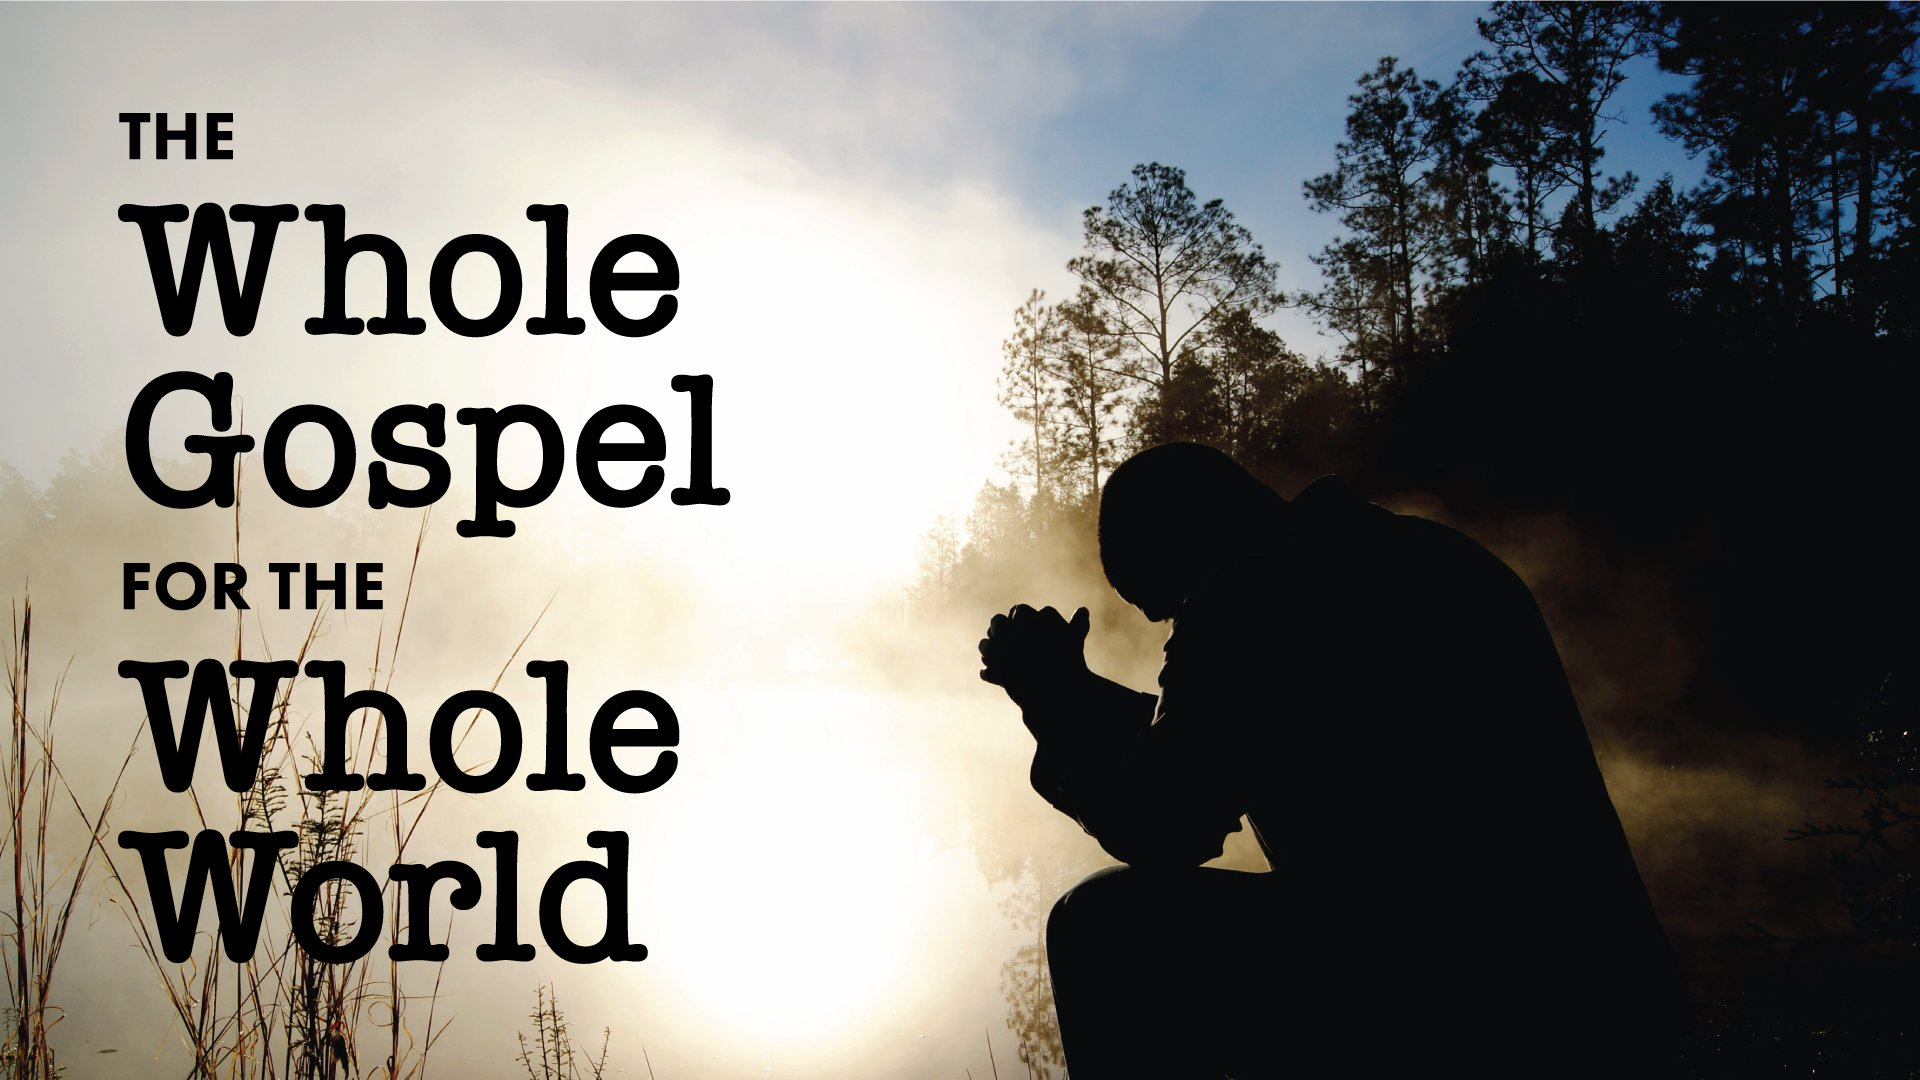 app-1920x1080-The-Whole-Gospel-